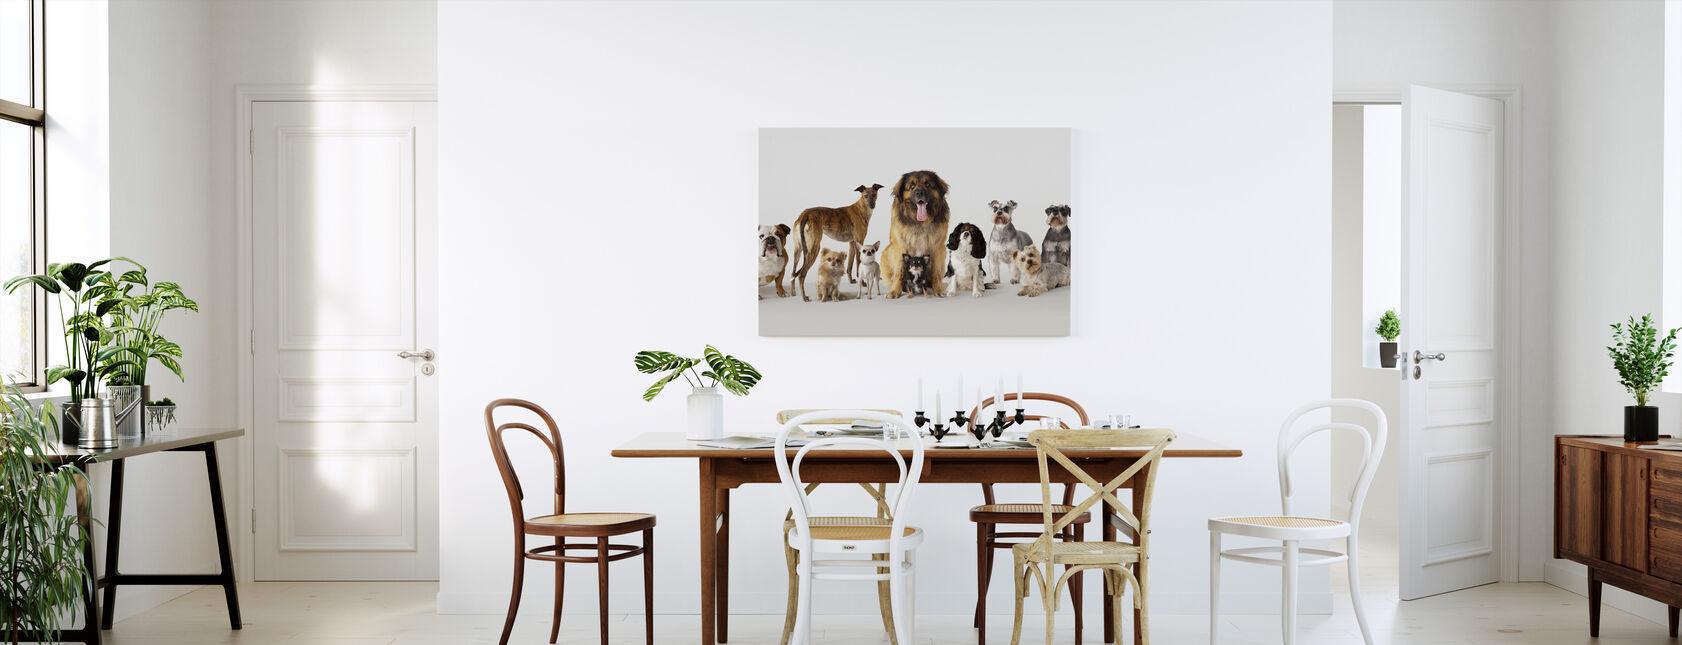 Group Portrait of Dogs - Canvas print - Kitchen